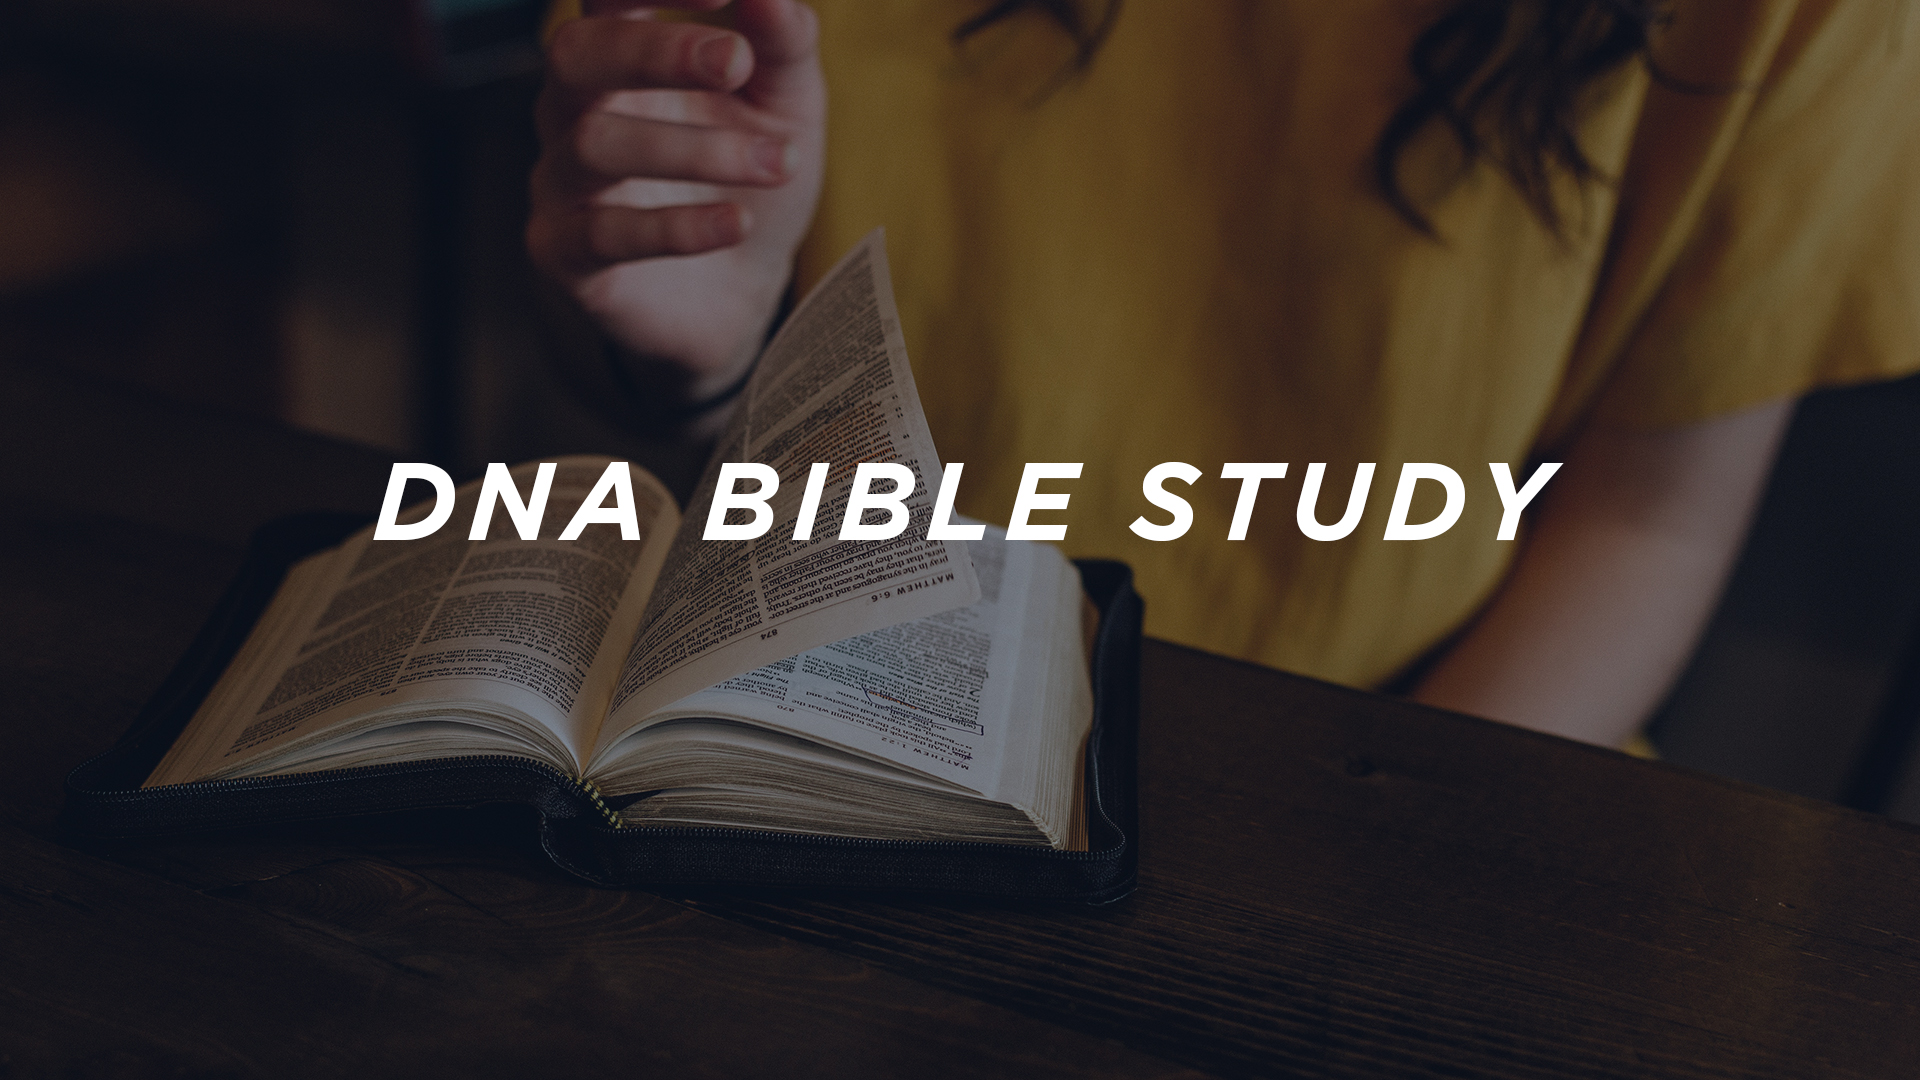 DNA-bible-study b.jpg